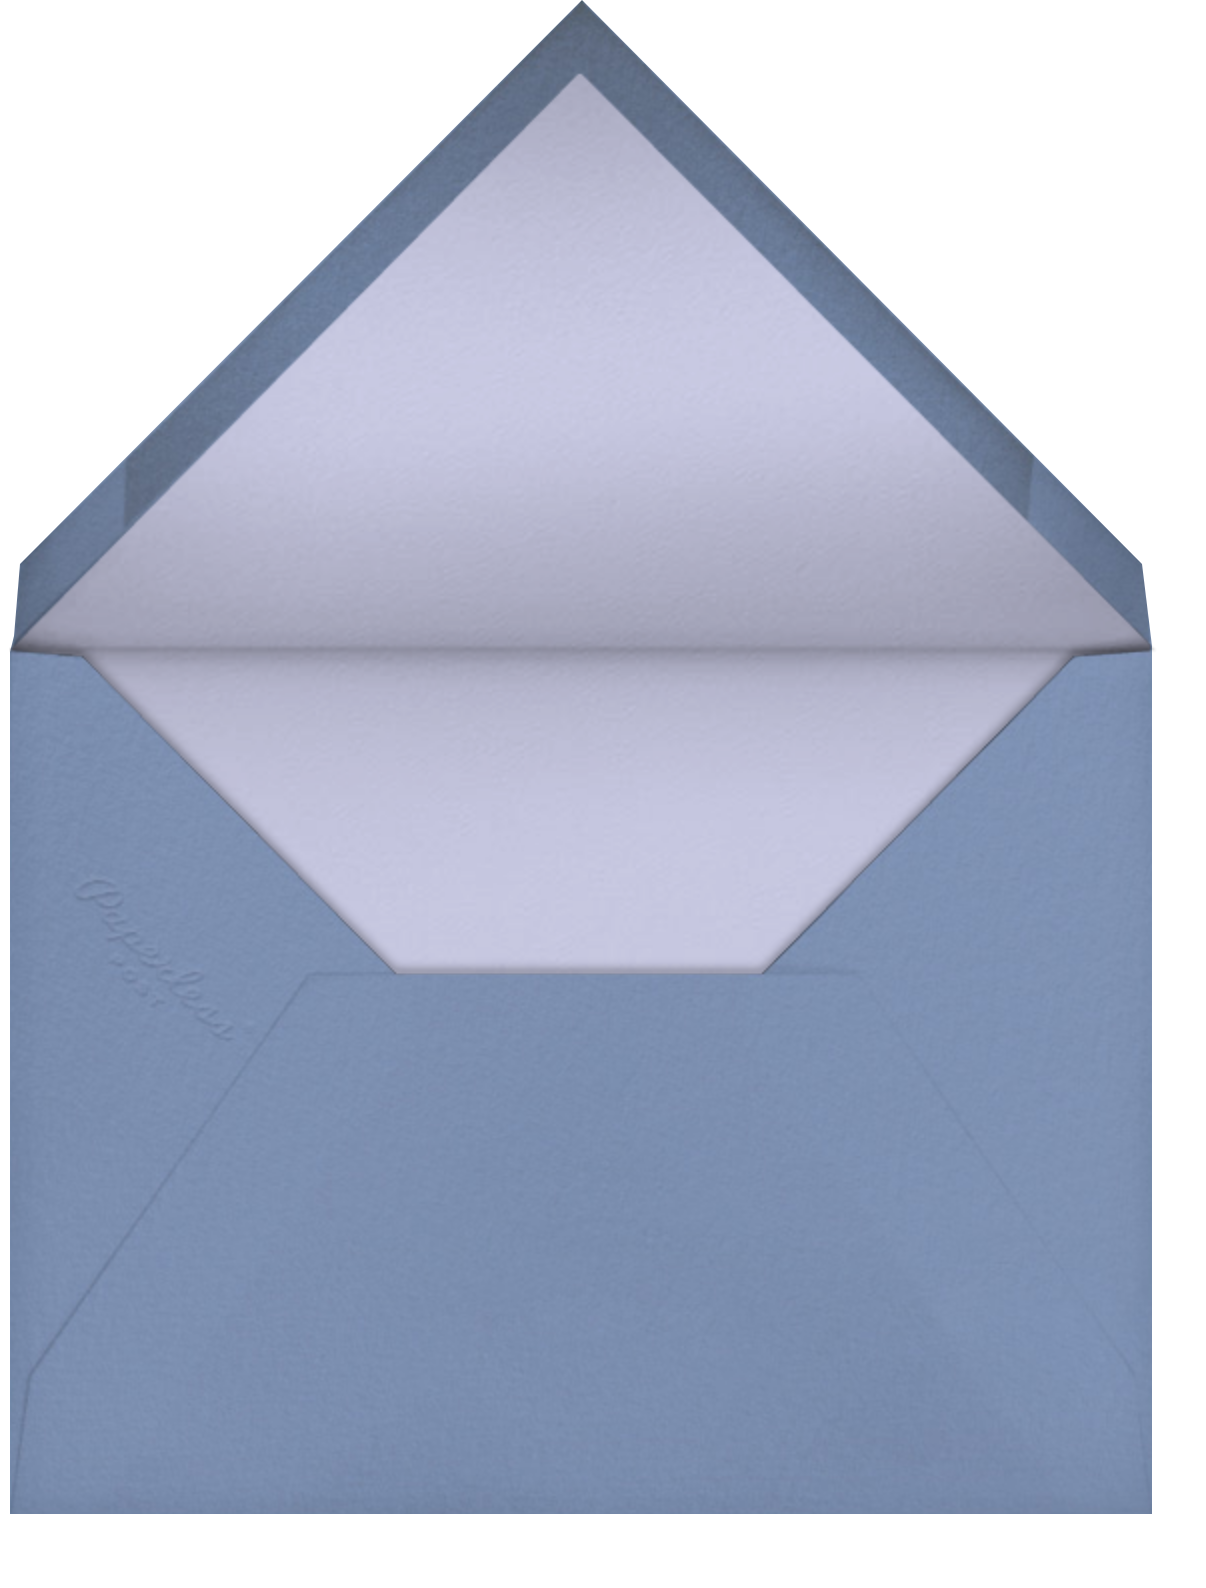 Ikat Diamond - Cornflower - Paperless Post - Envelope